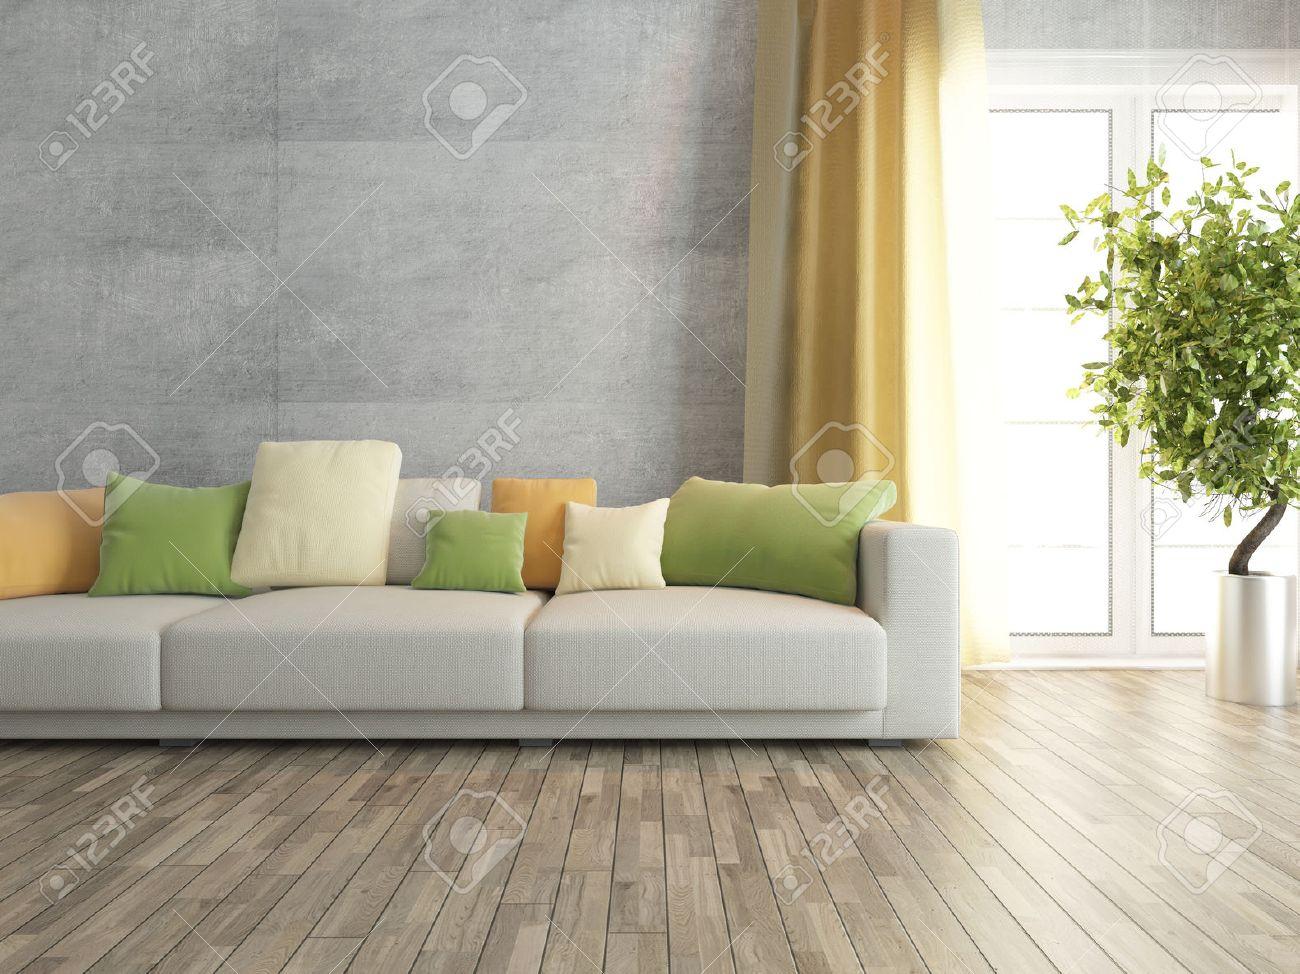 Concrete Wall With Sofa Interior Design Stock Photo Picture And